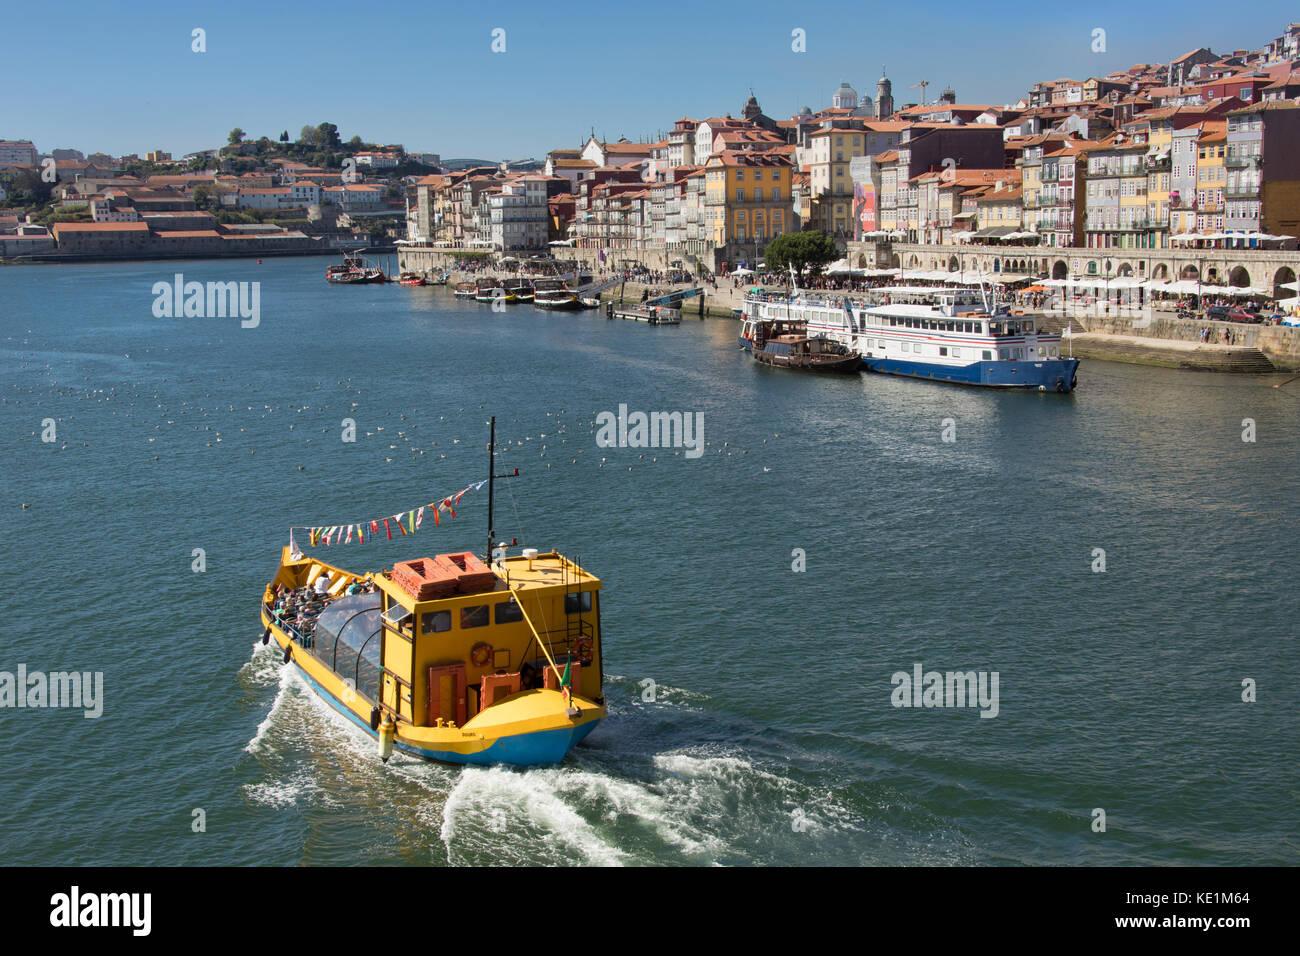 River Tour Boat on the Douro River, Porto, Porttugal - Stock Image